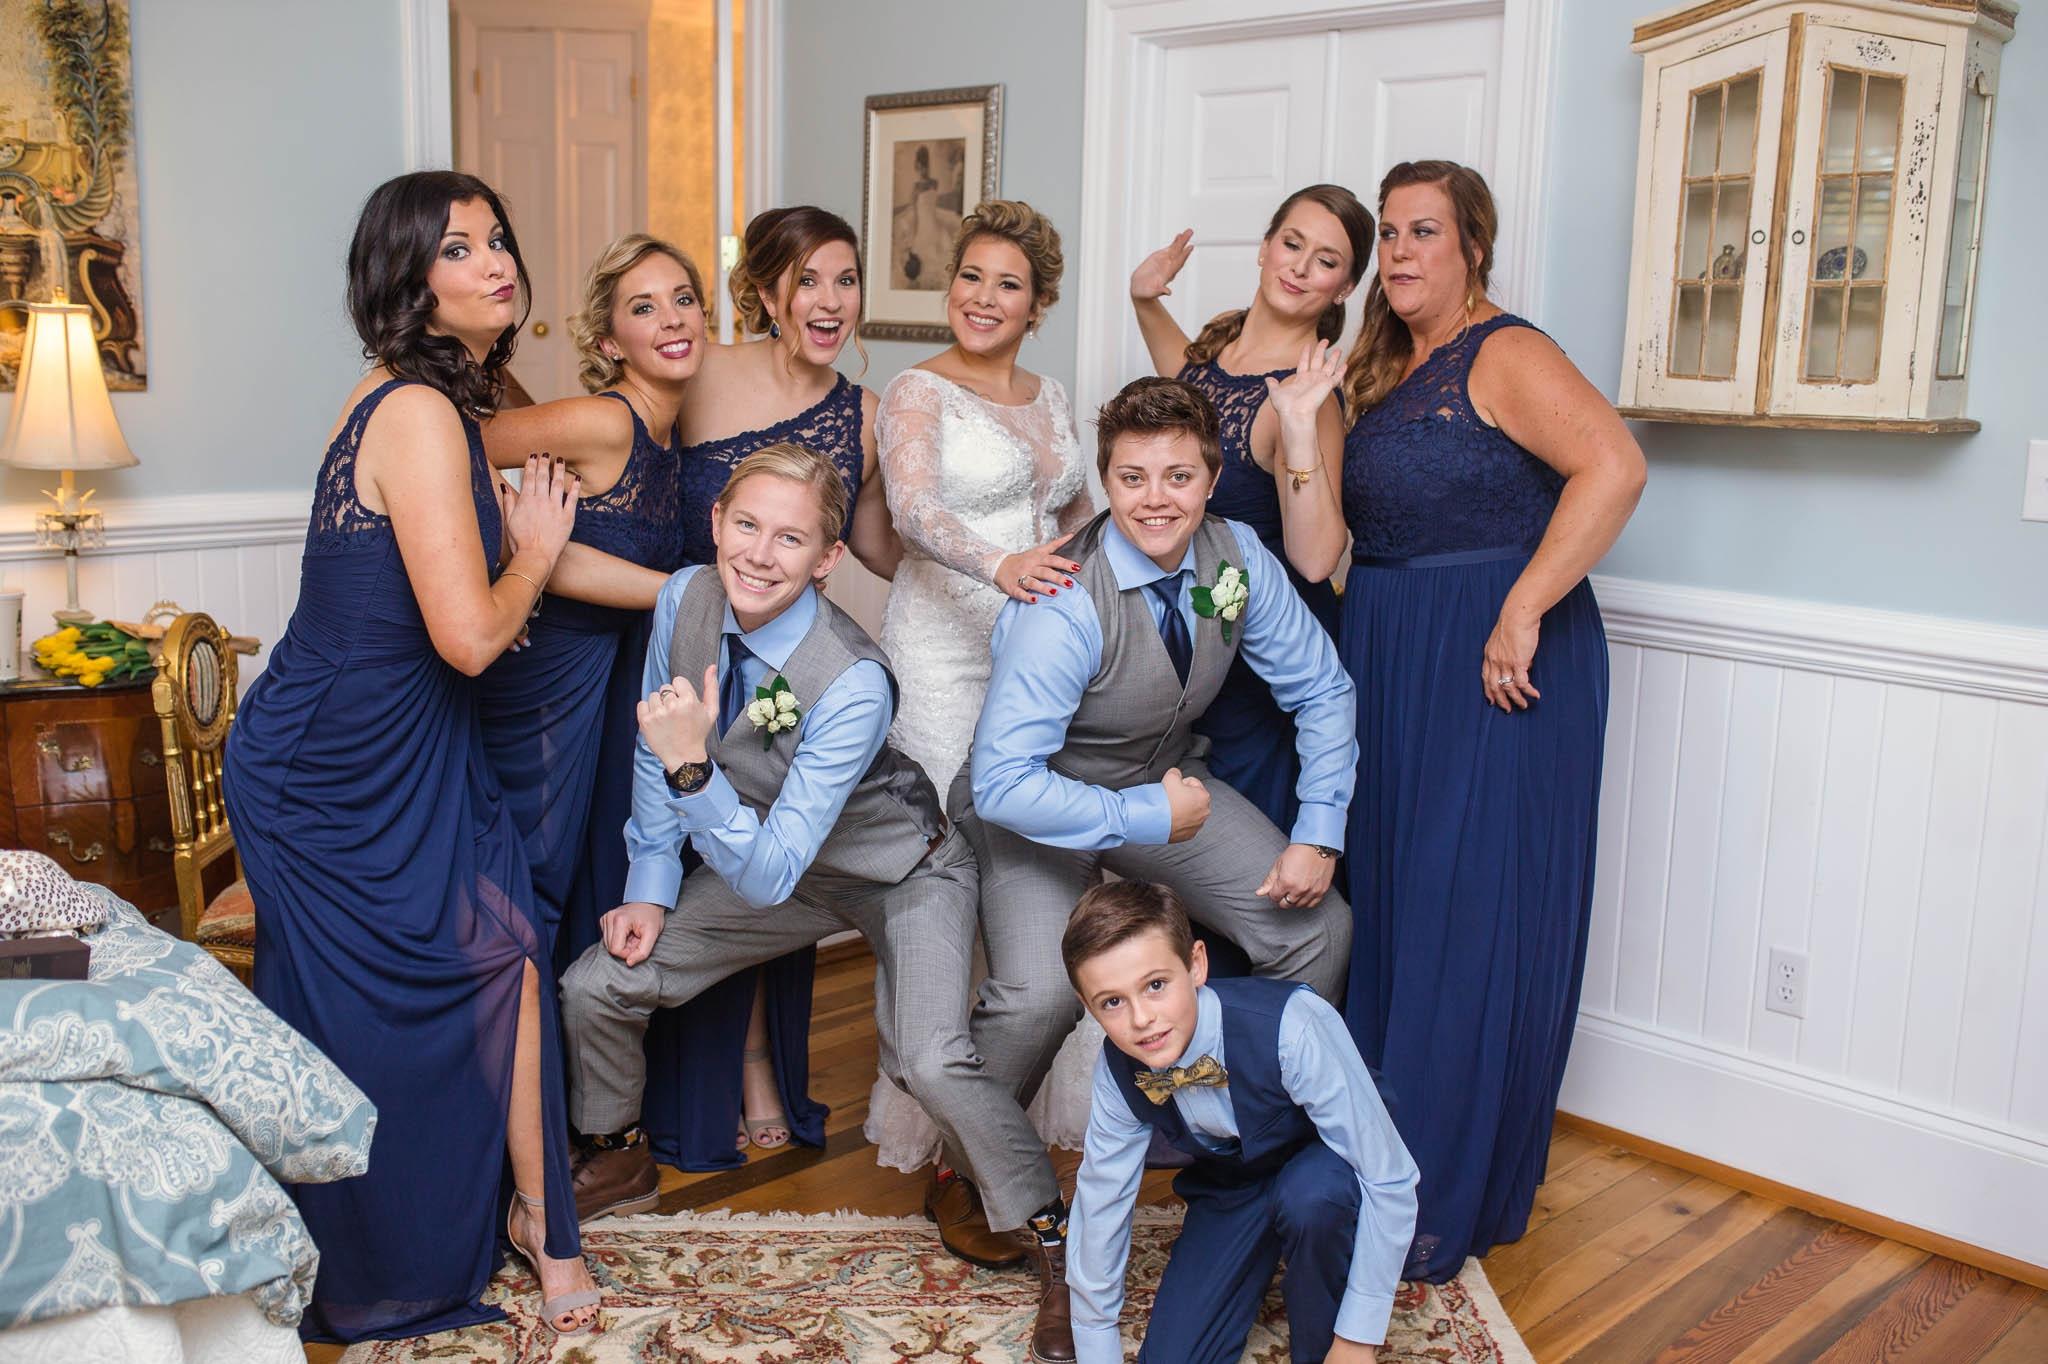 Gay Wedding in Cary North Carolina